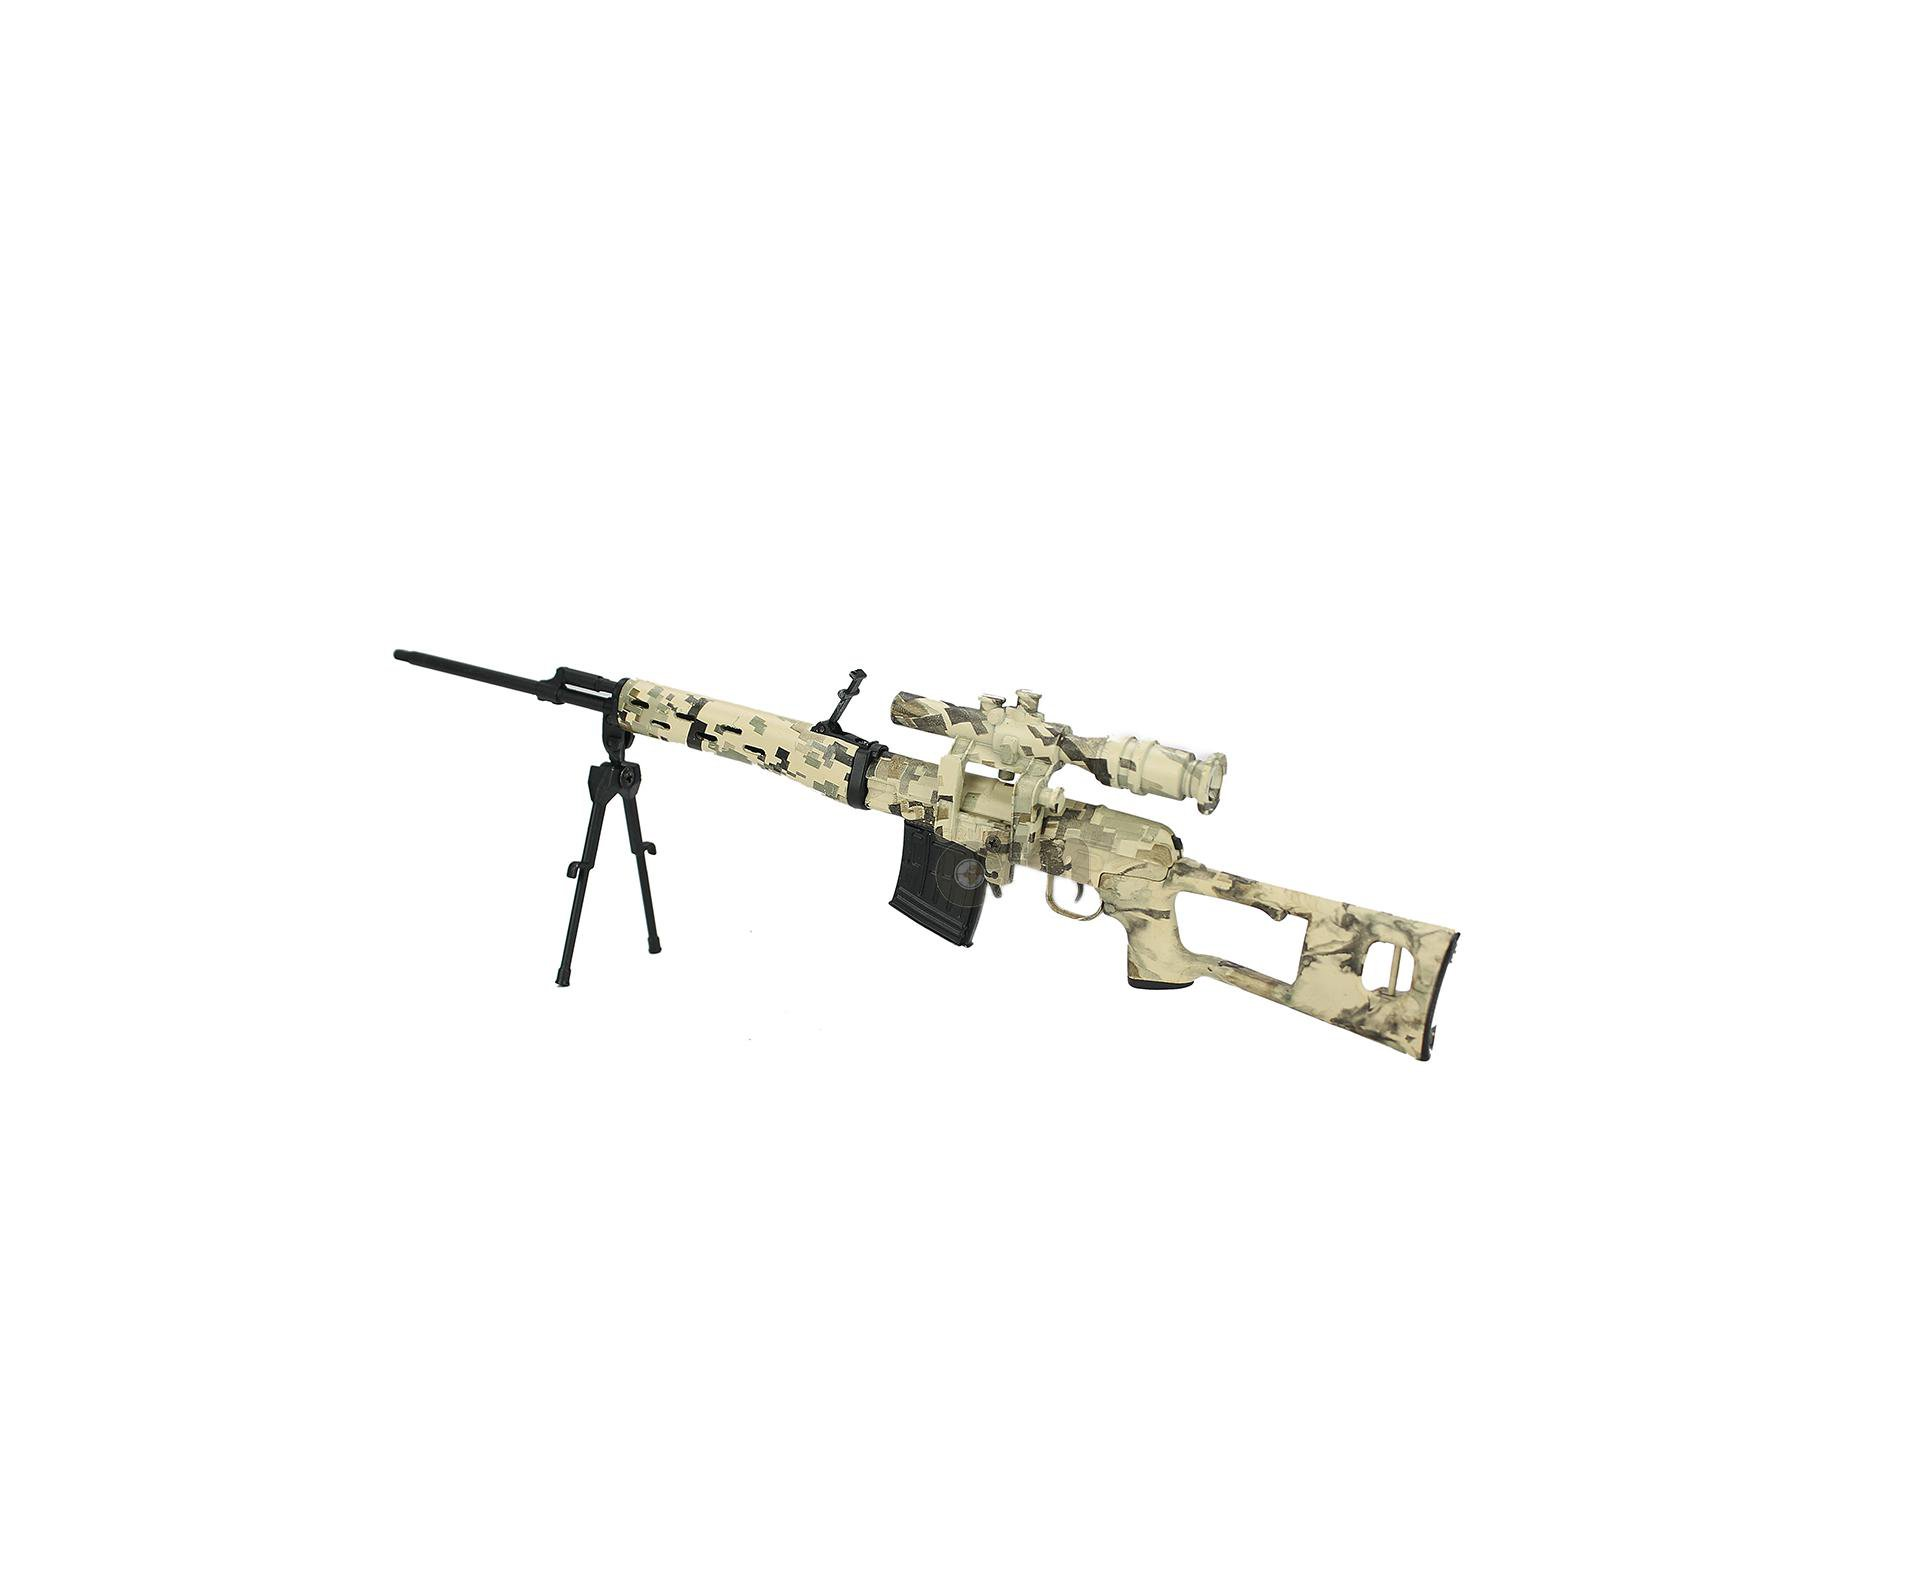 Rifle Sniper Dragunov Camuflada Miniatura Metálica - Arsenal Guns